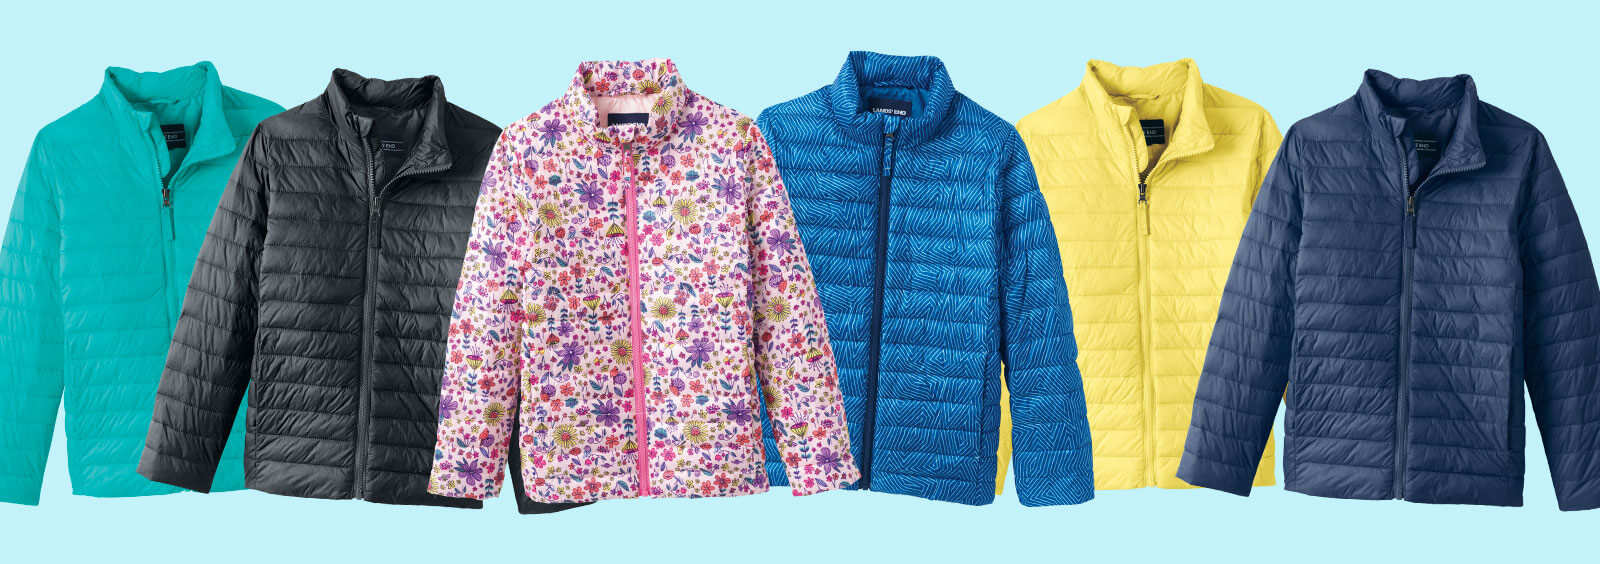 Best Kids' Winter Coats for a Tropical Getaway